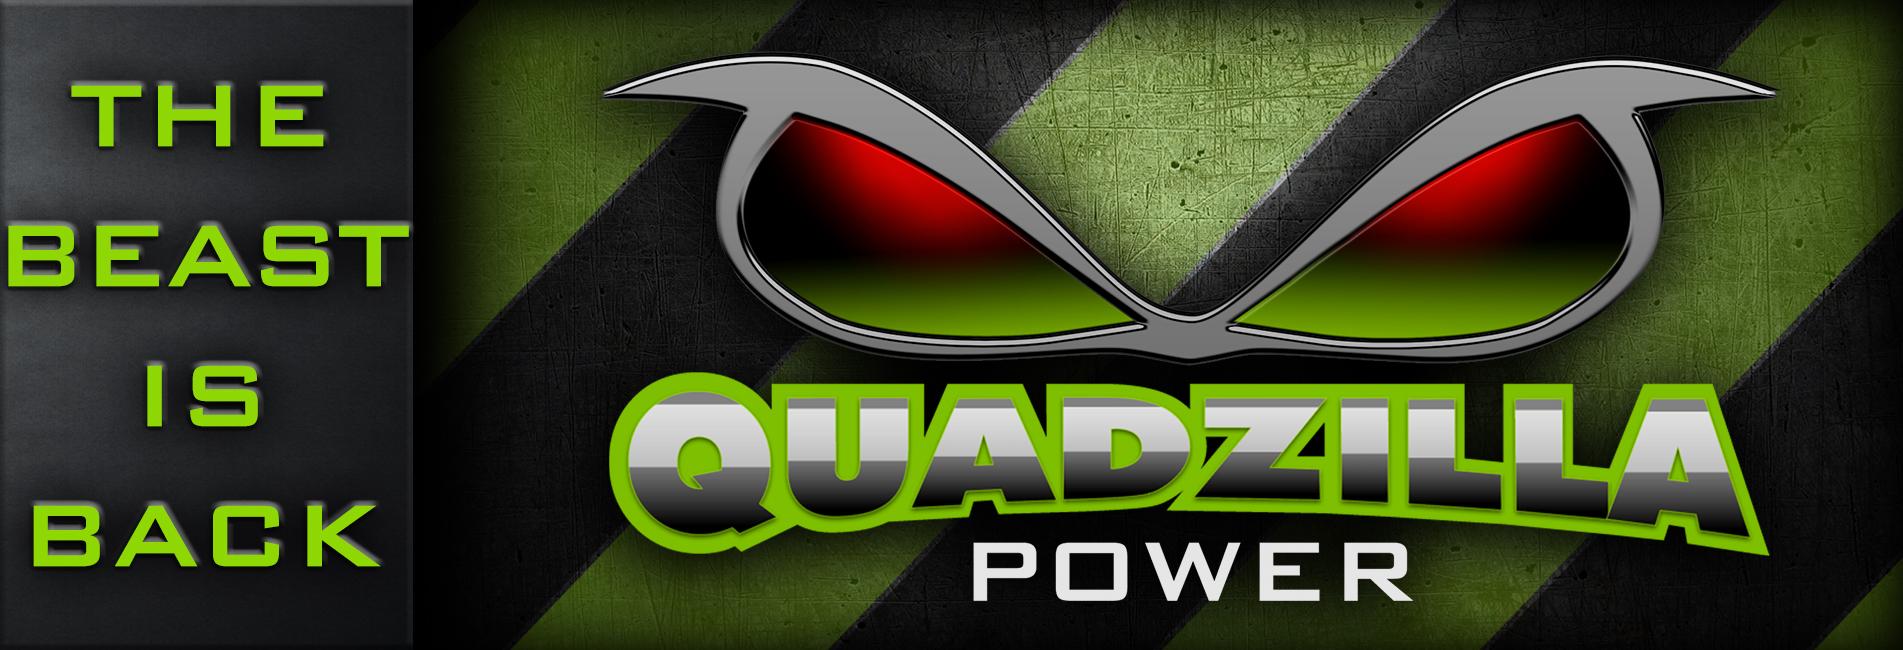 main_banner__42525?t=1503436778 quadzilla quadzilla adrenaline wiring diagram at aneh.co